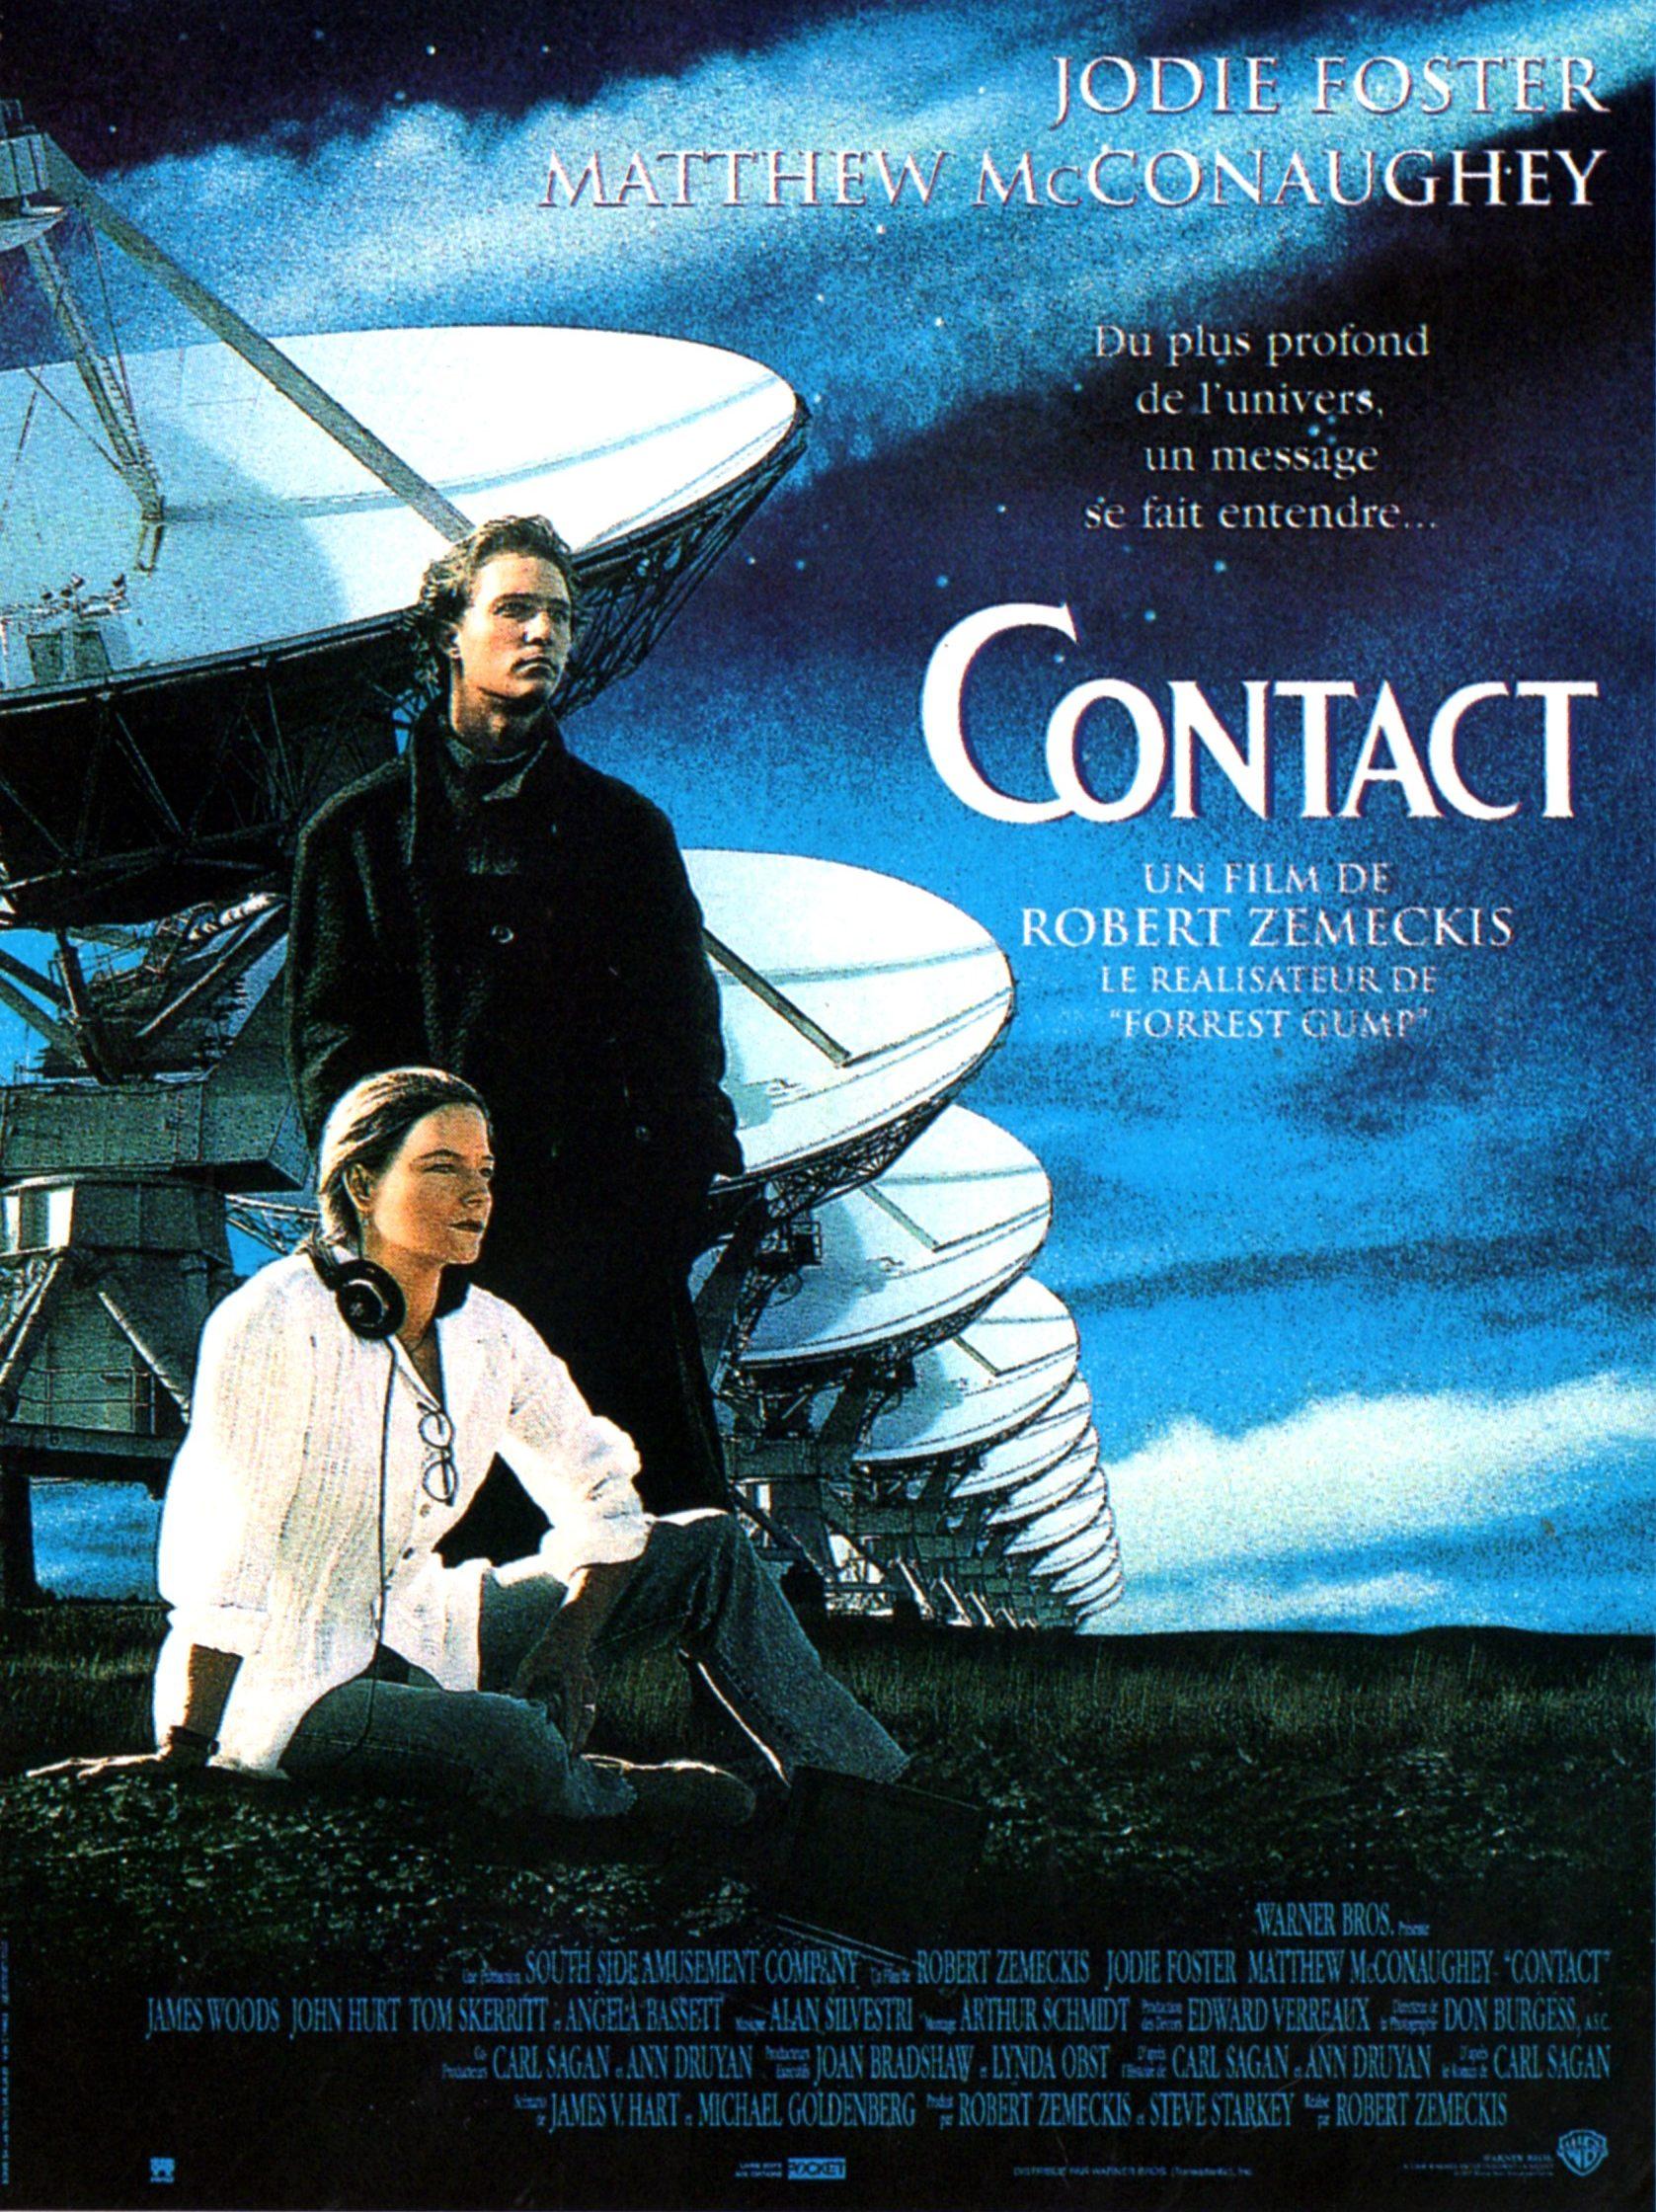 Affiche du film Contact de Robert Zemeckis